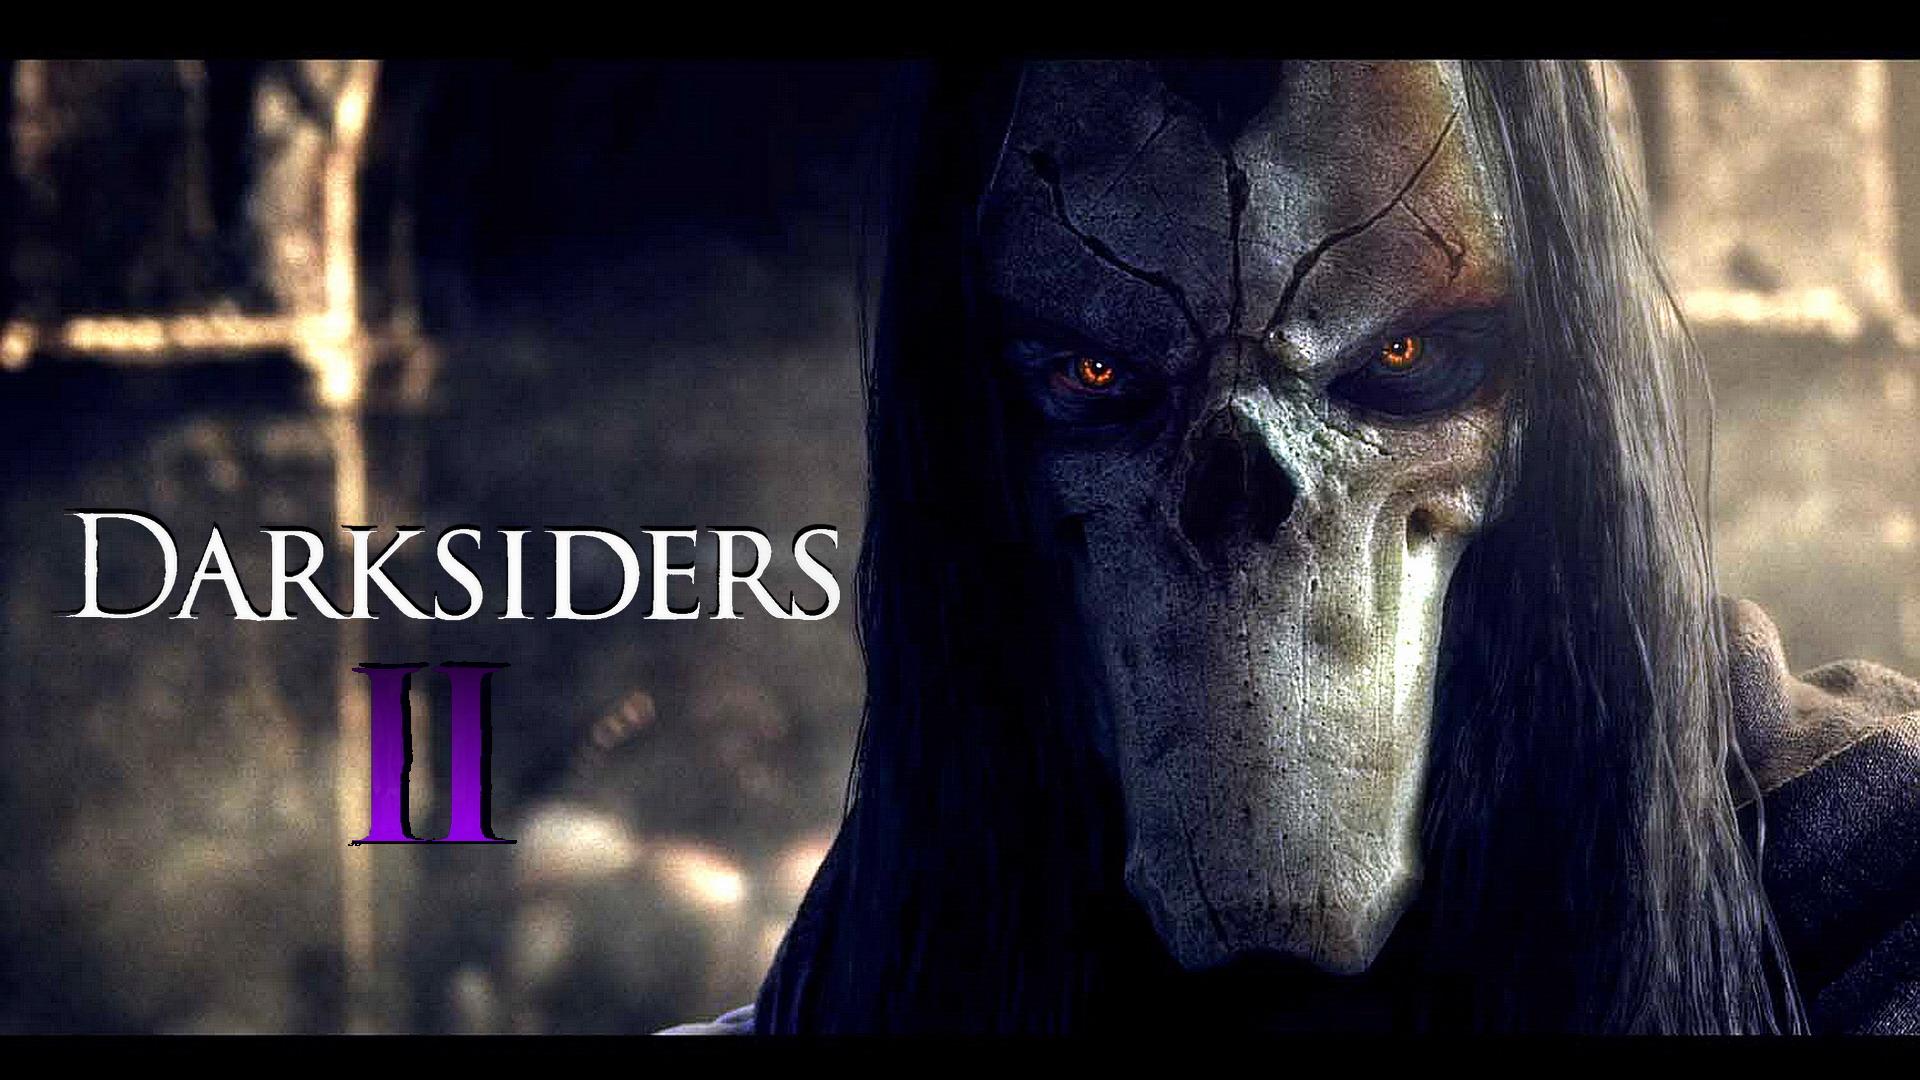 Darksiders Fantasy Warrior F Wallpaper 1920x1080 152727